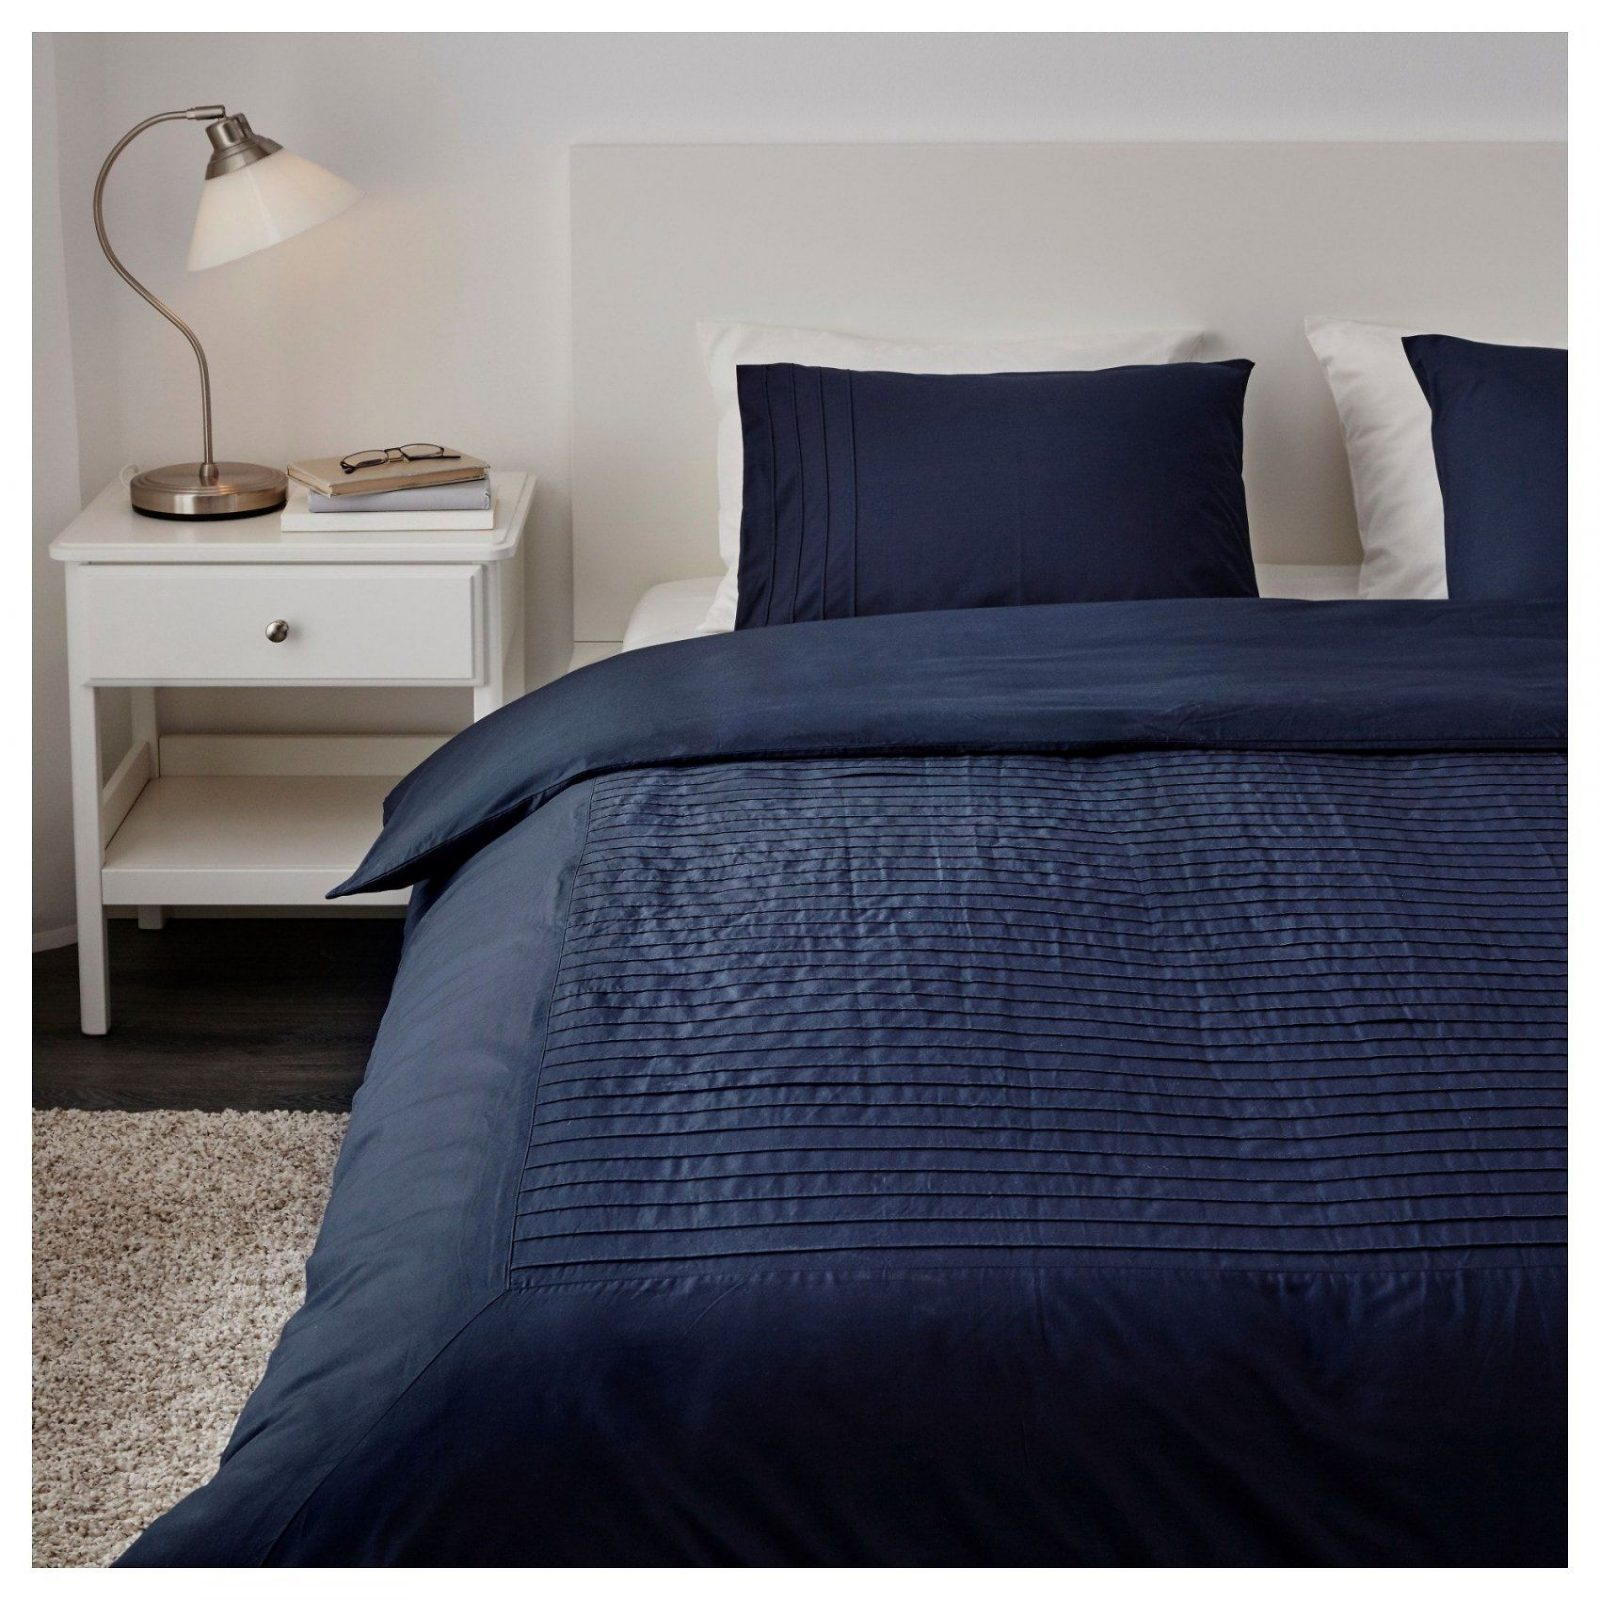 luxus bettw sche 200 200 ikea skrpil quilt cover and 4. Black Bedroom Furniture Sets. Home Design Ideas